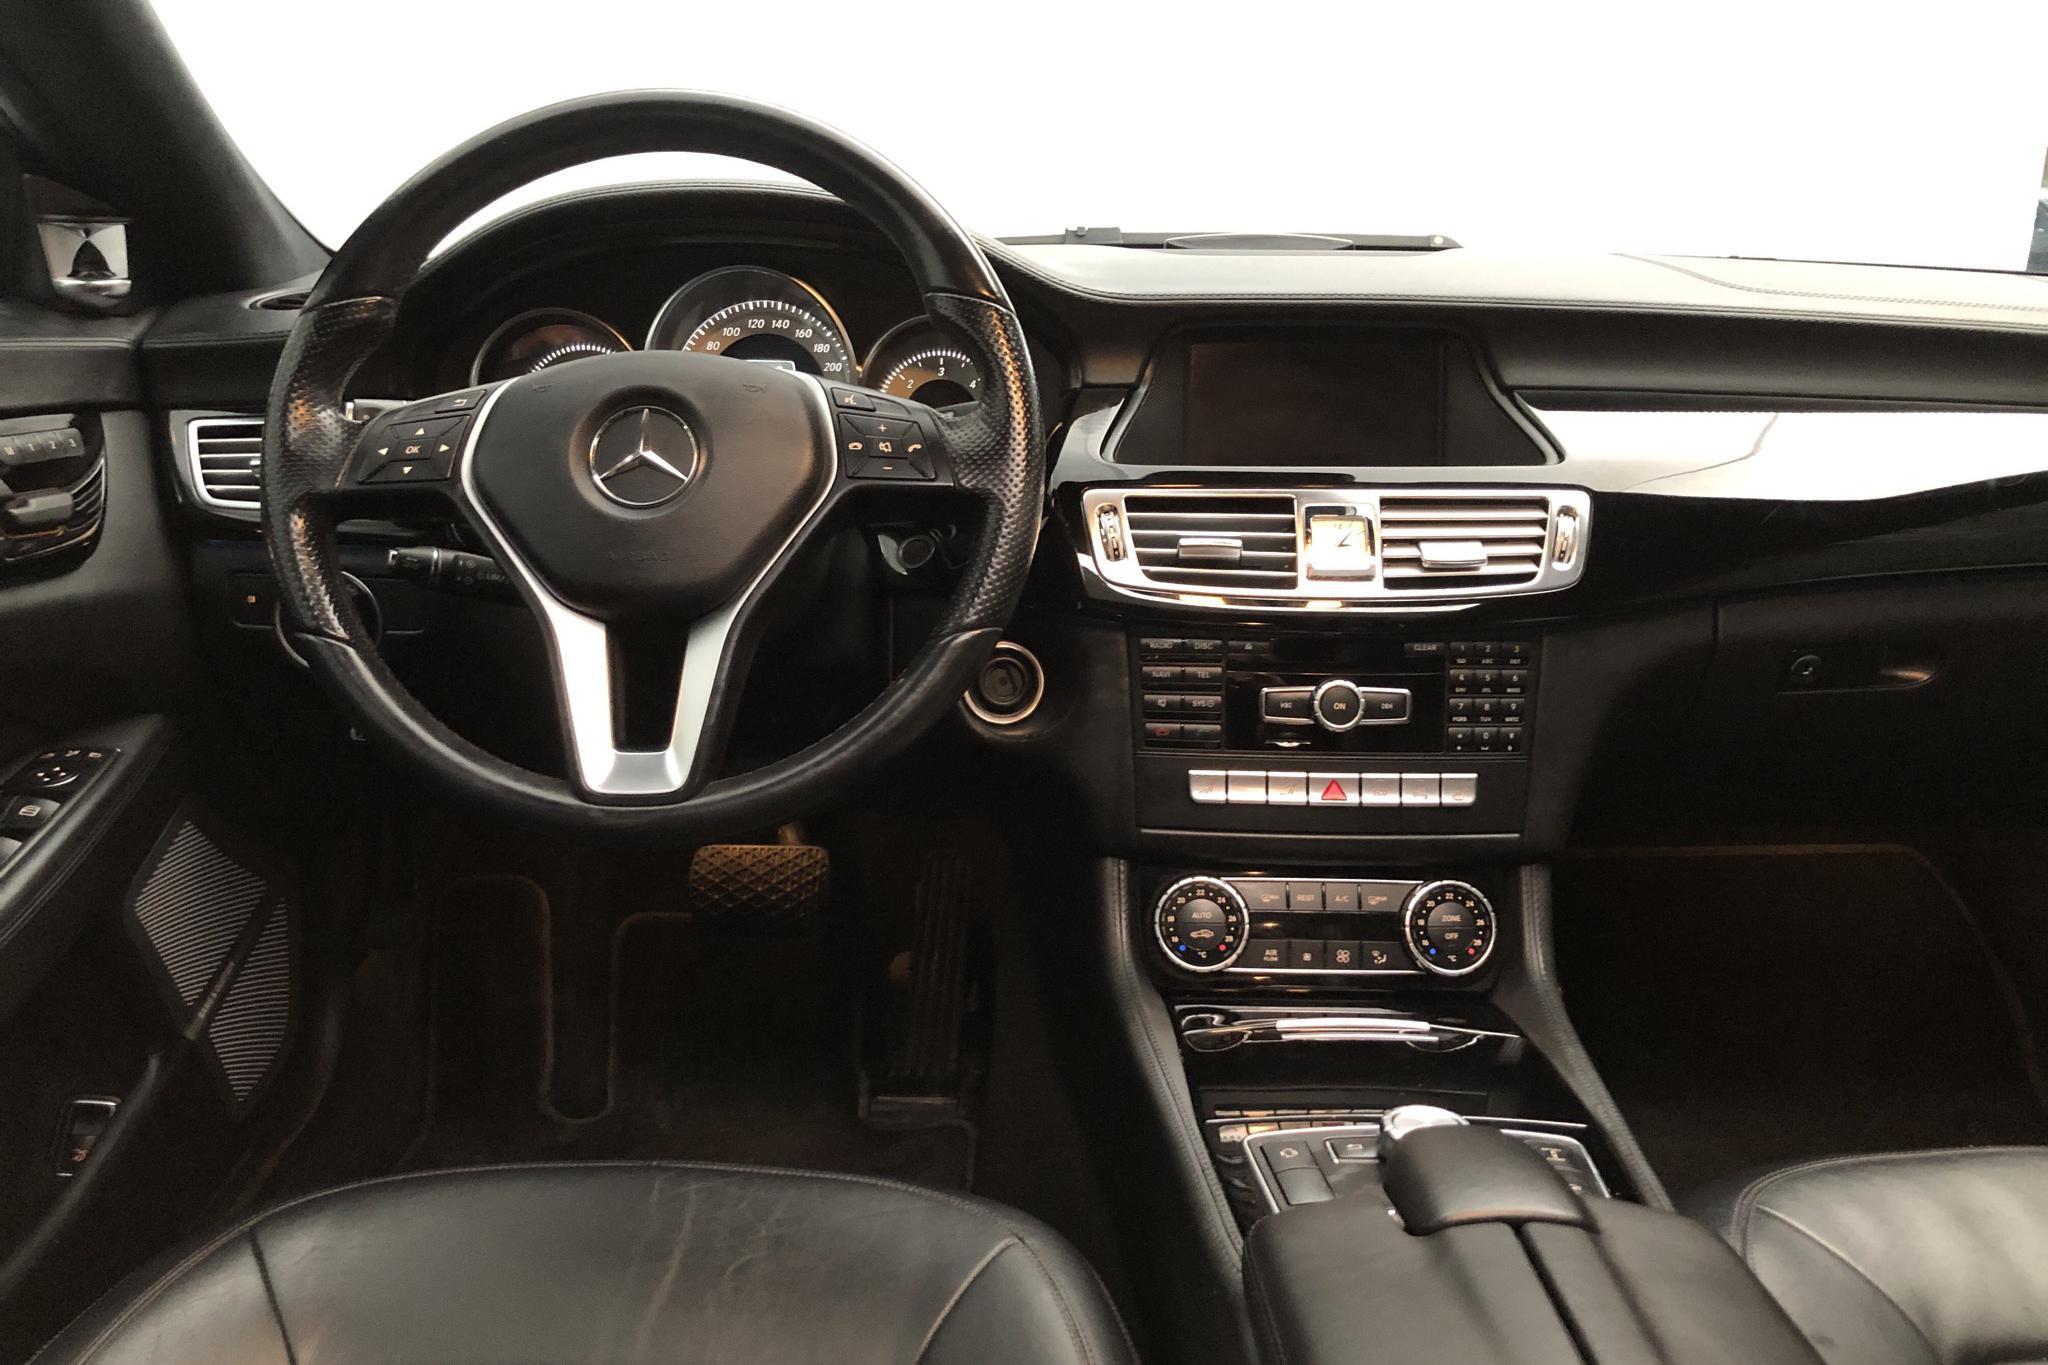 Mercedes CLS 350 CDI 4MATIC Shooting Brake (265hk) - 10 980 mil - Automat - Dark Grey - 2014